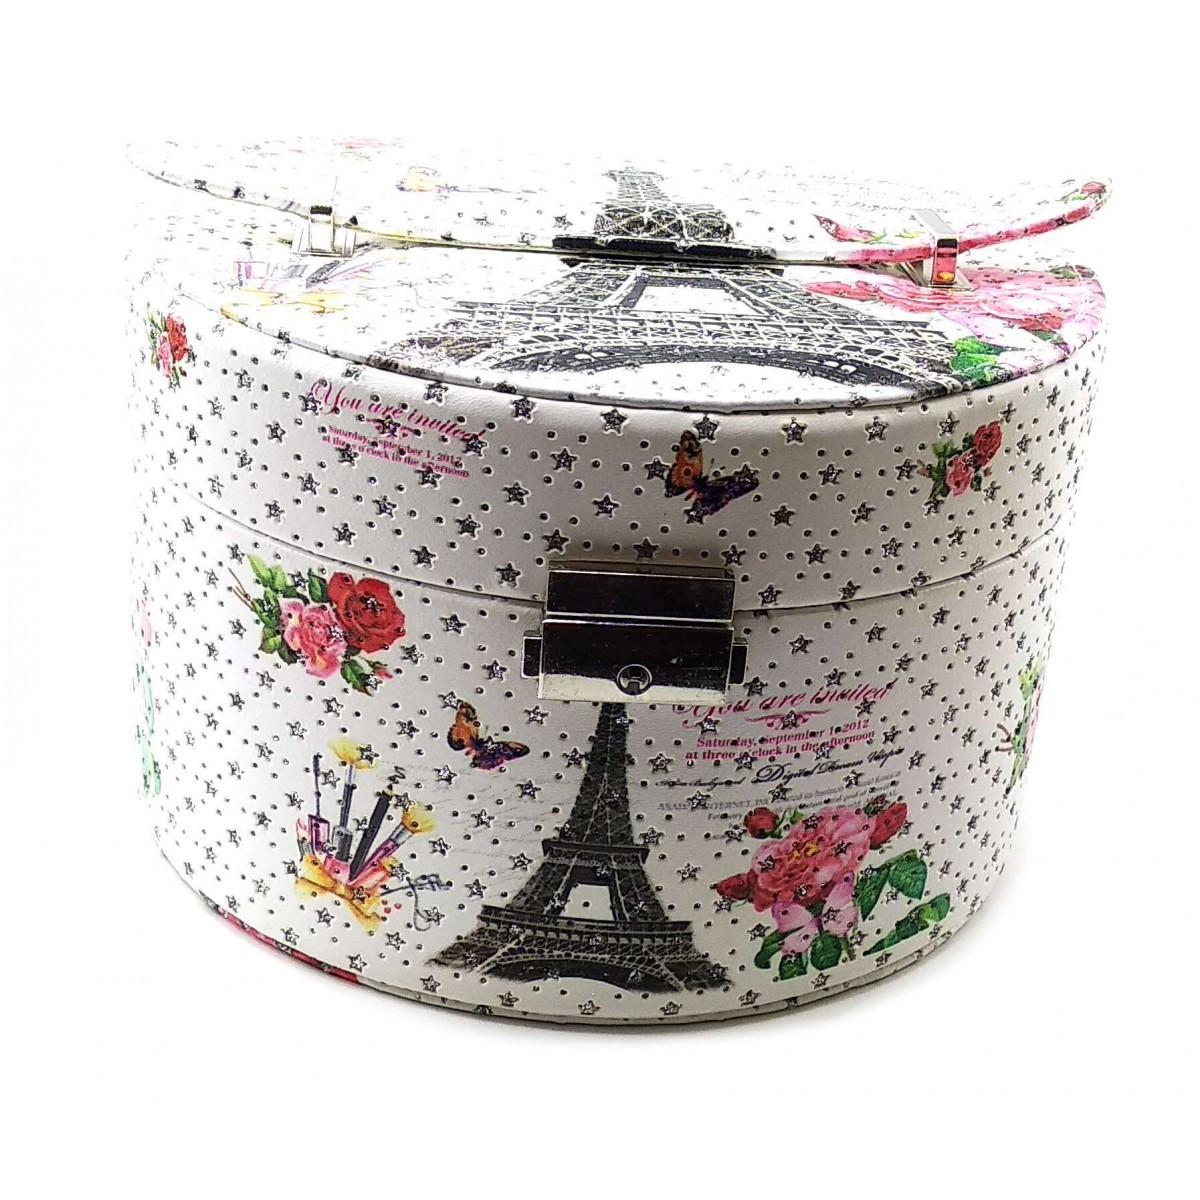 Шкатулка для бижутерии с зеркалом Париж